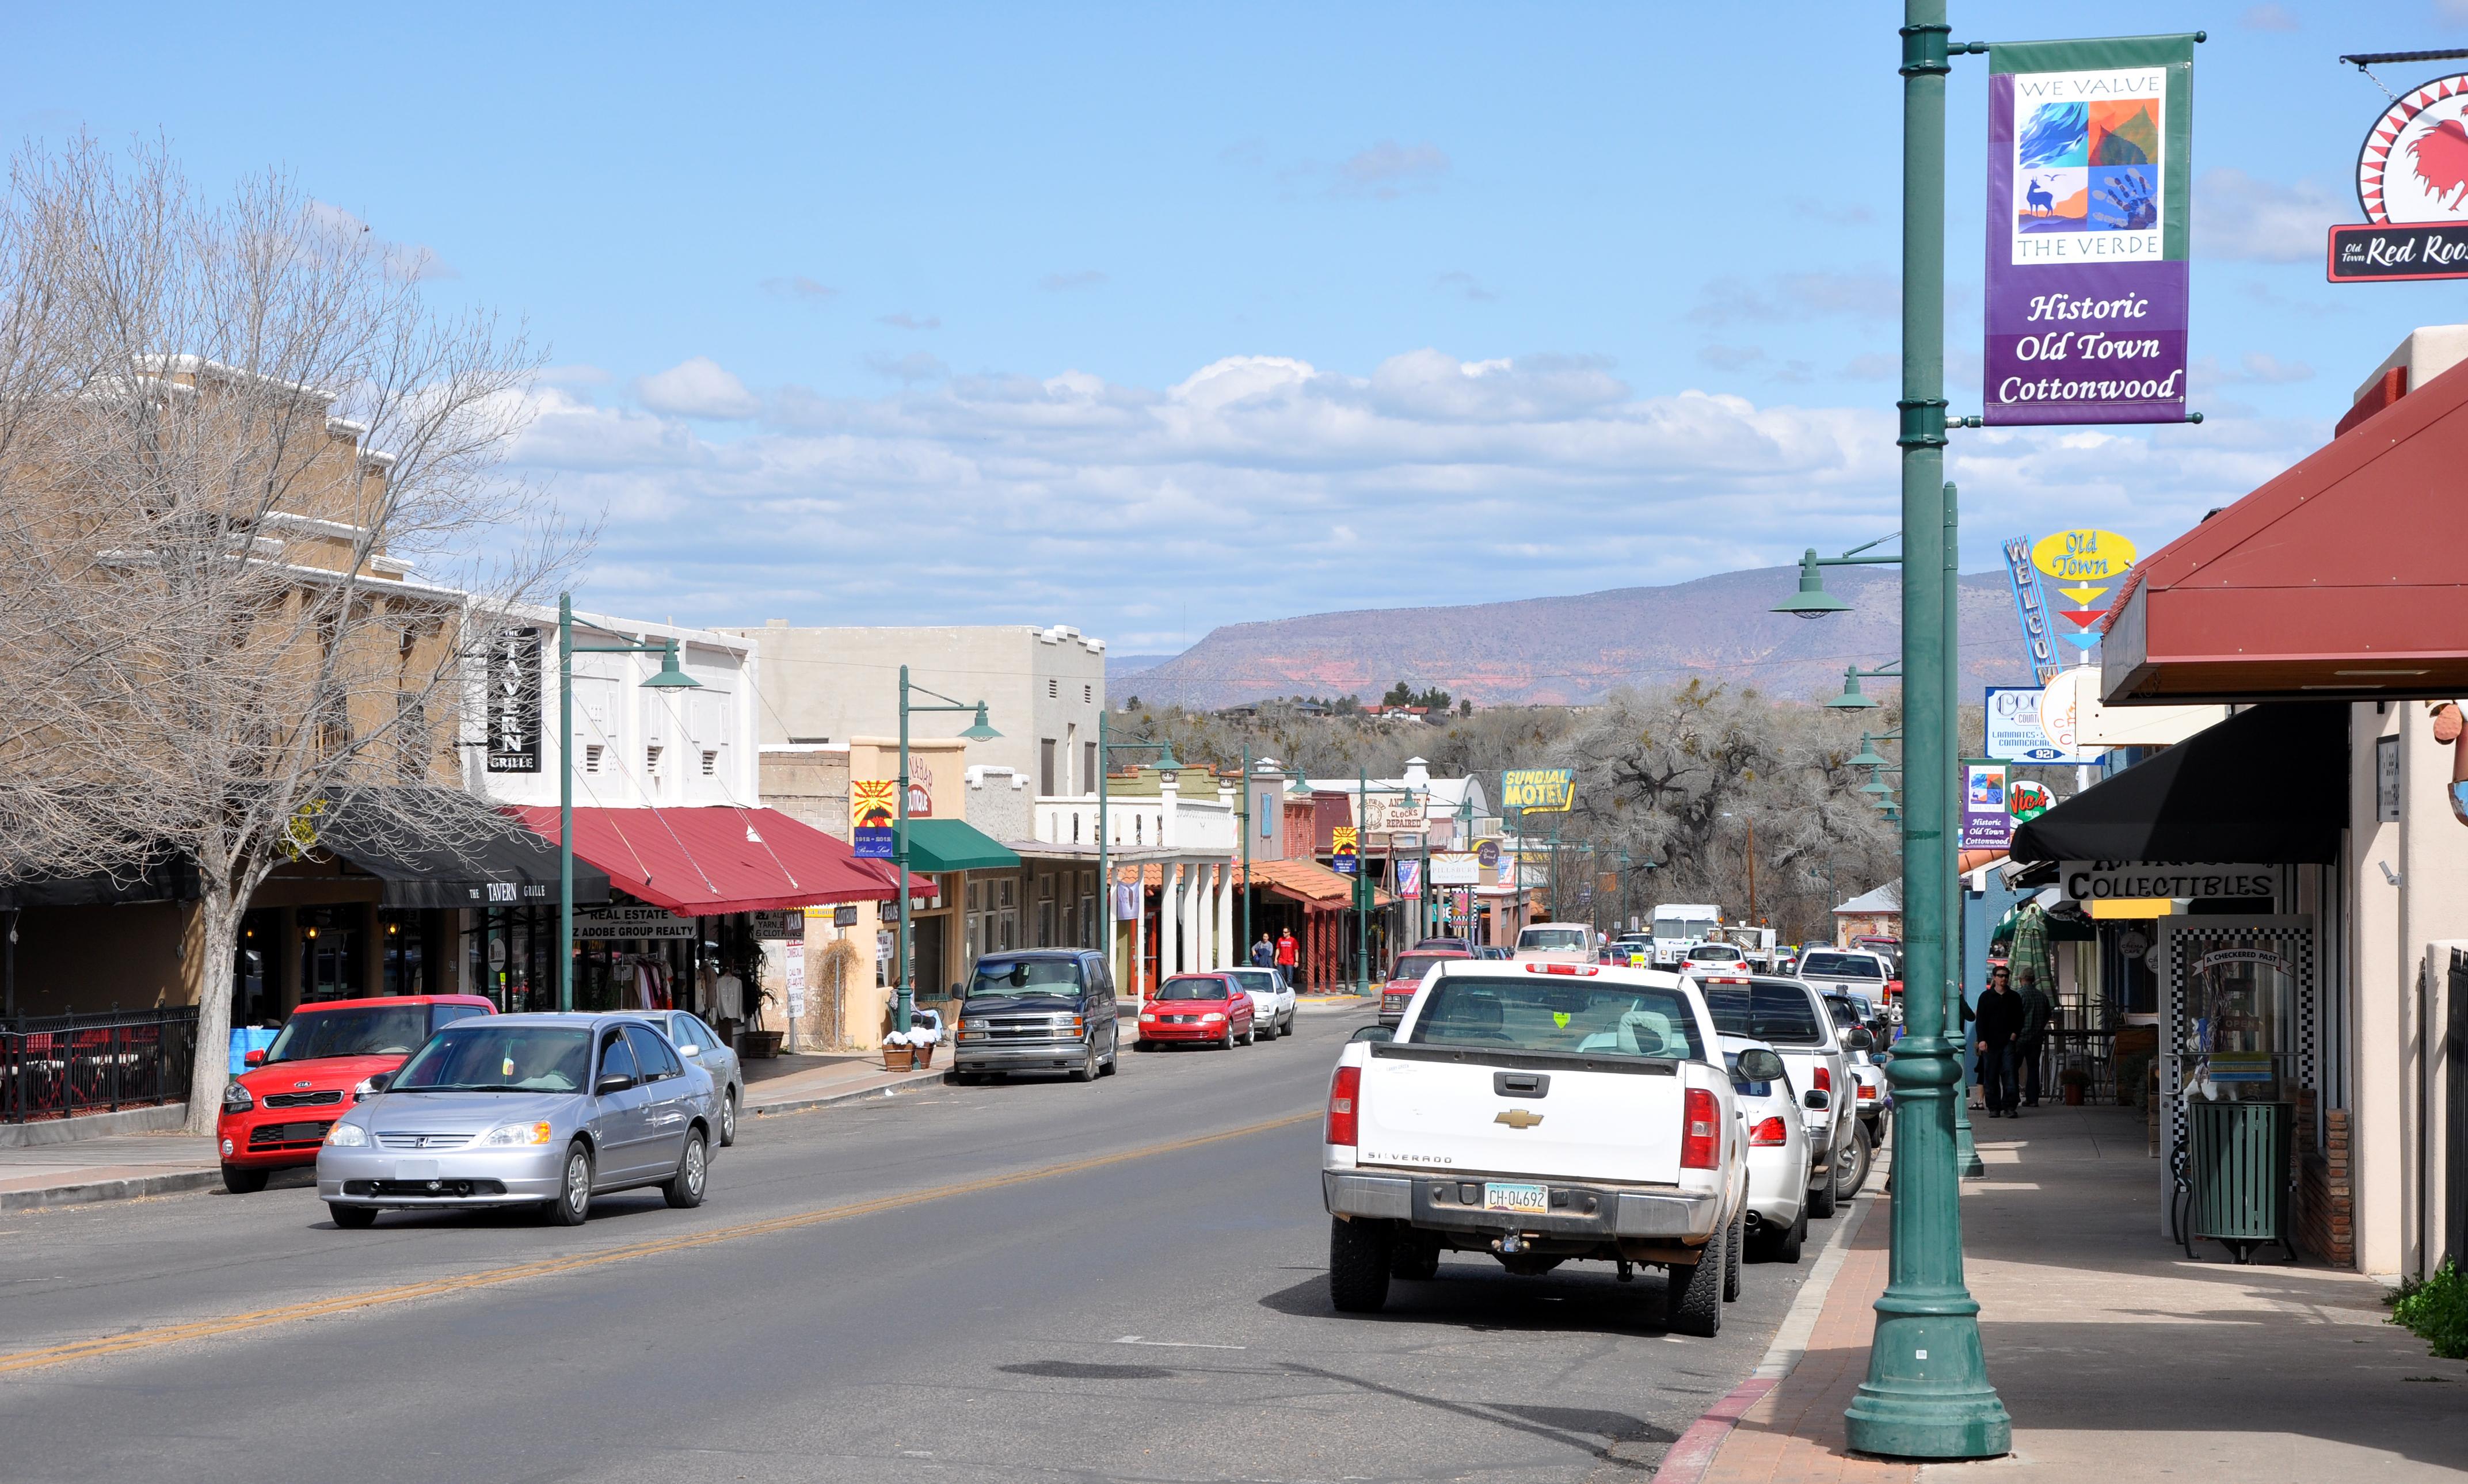 Commercial_Historic_District_(Cottonwood,_Arizona)